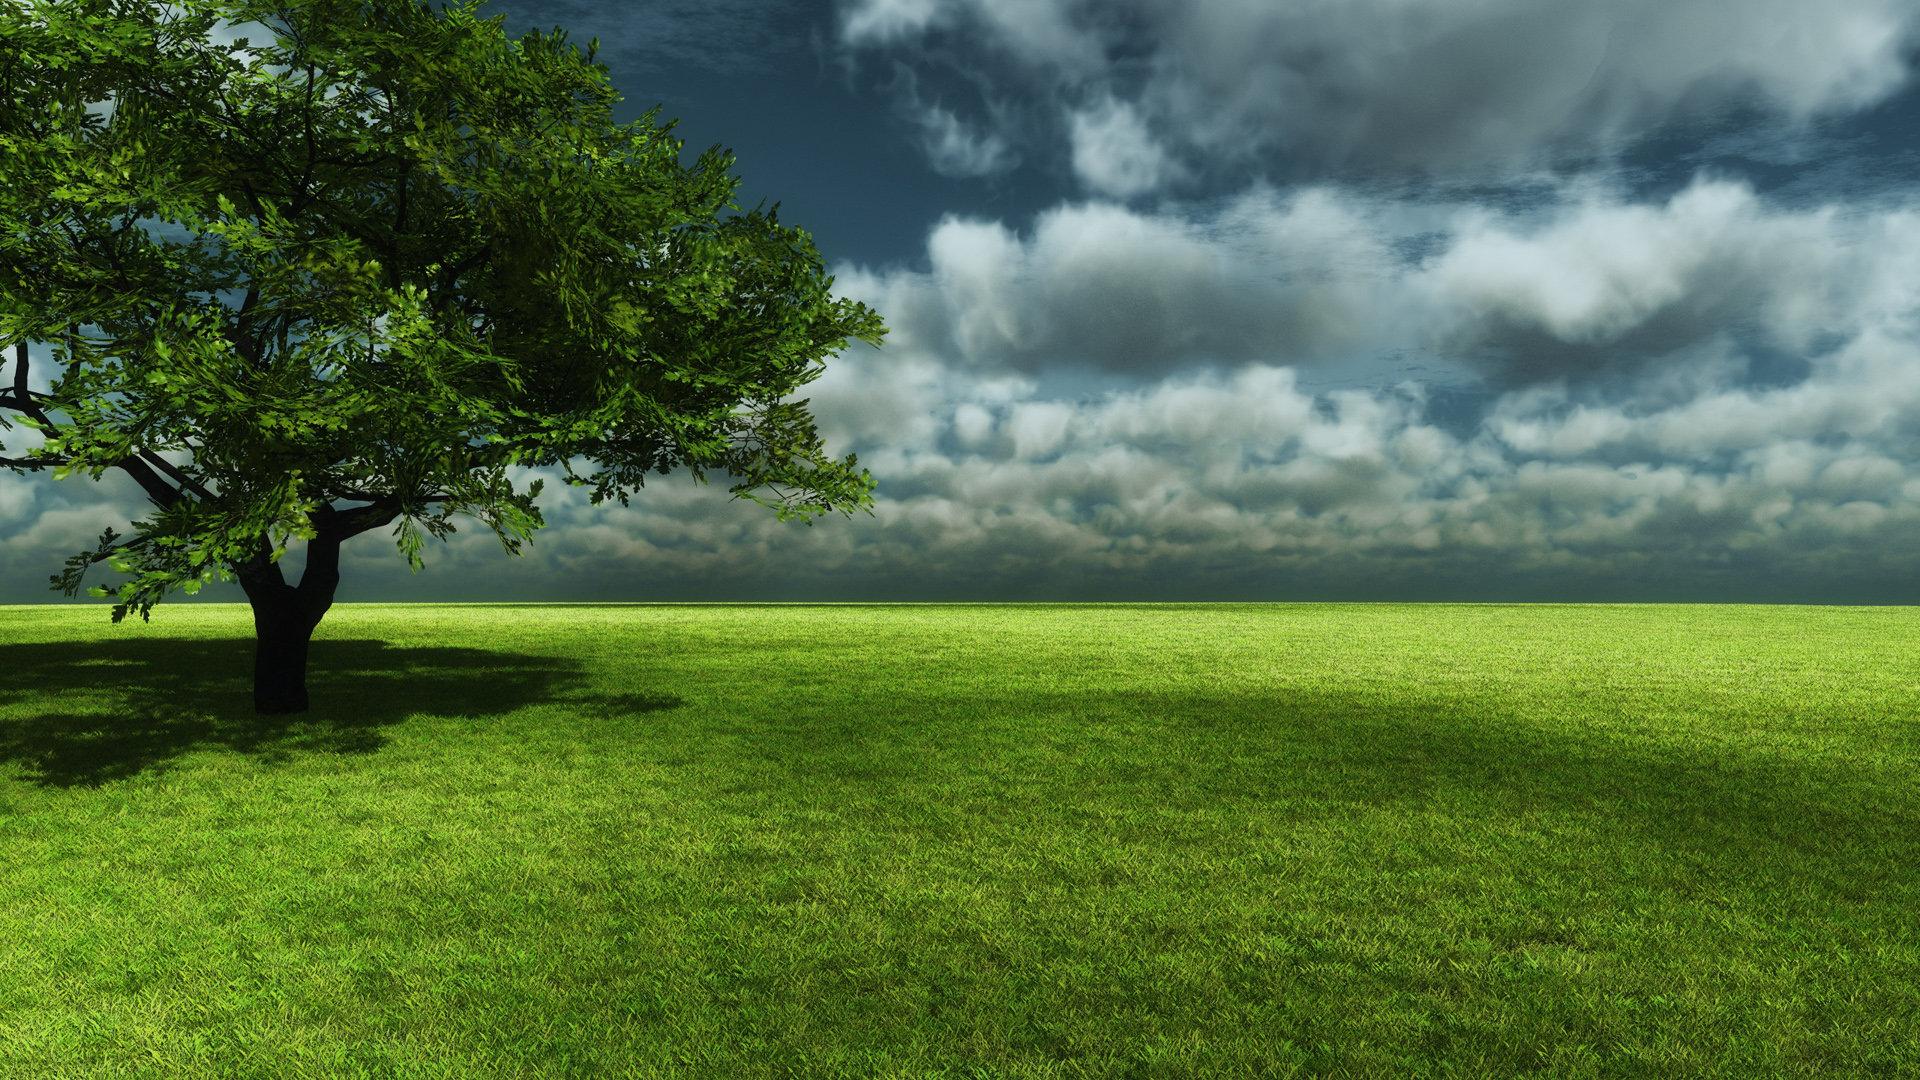 Best Tree Wallpaper Id76812 For High Resolution Full Hd